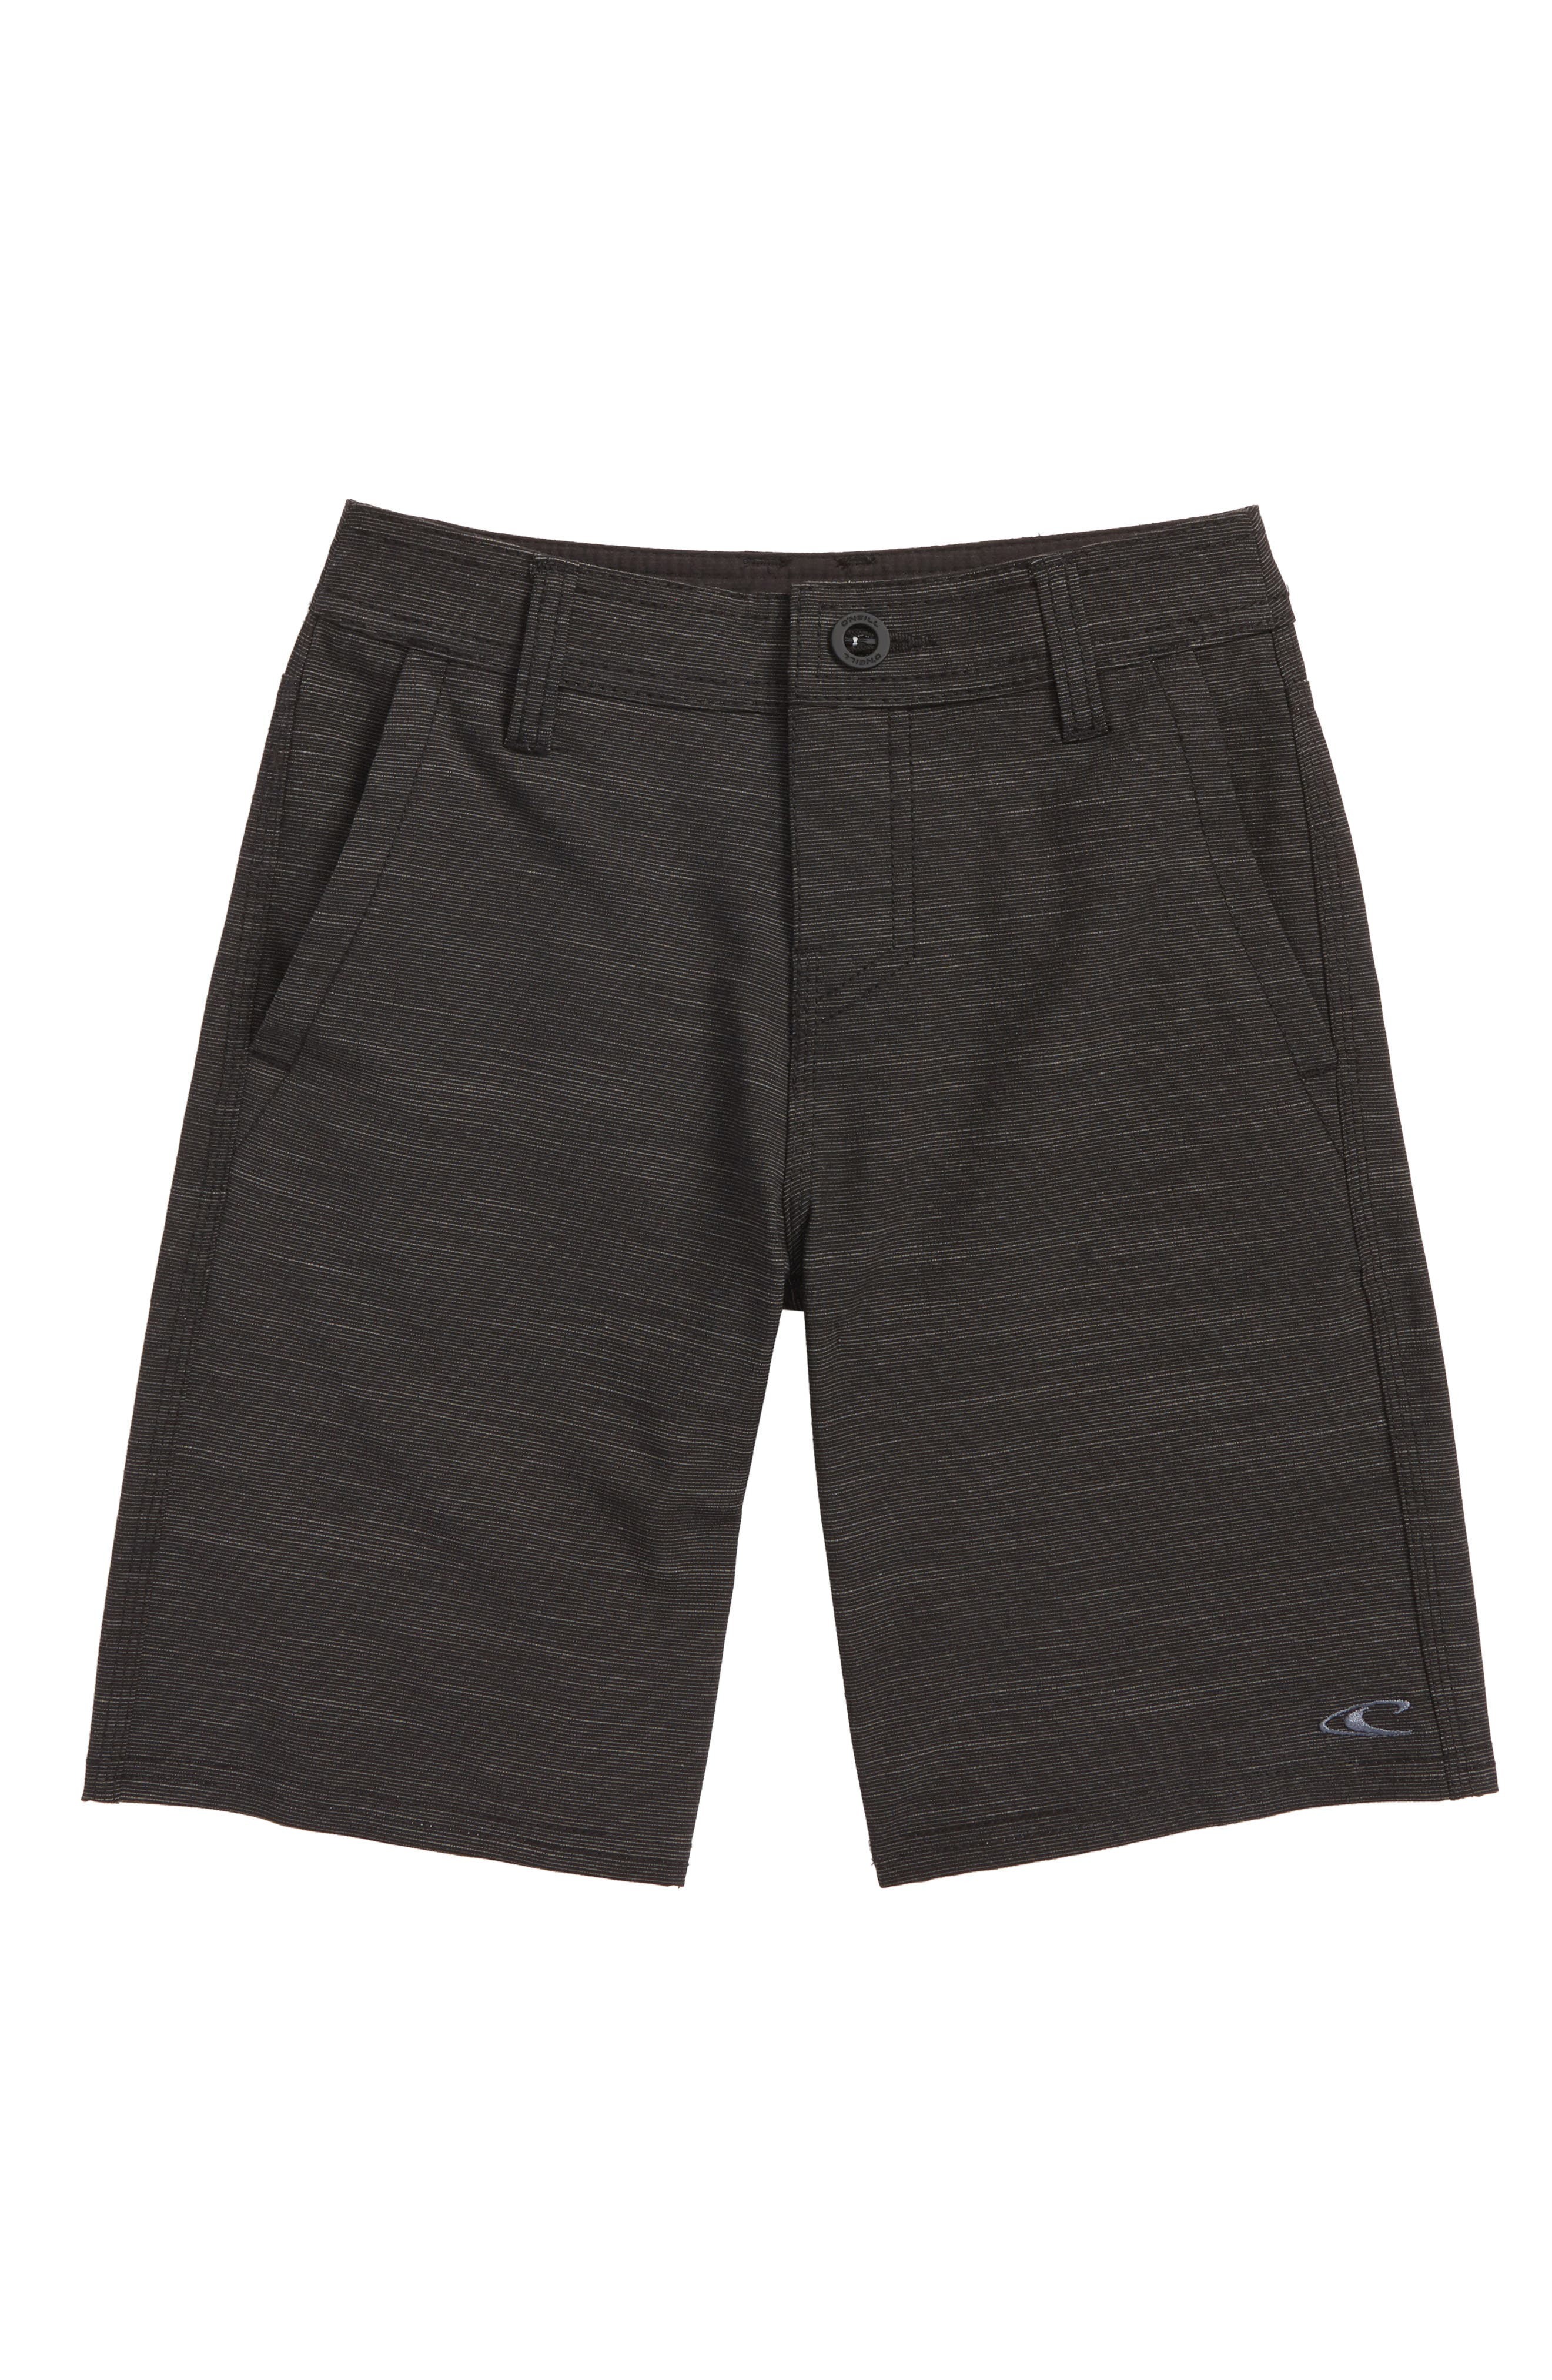 Locked Slub Hybrid Board Shorts,                             Main thumbnail 1, color,                             Black